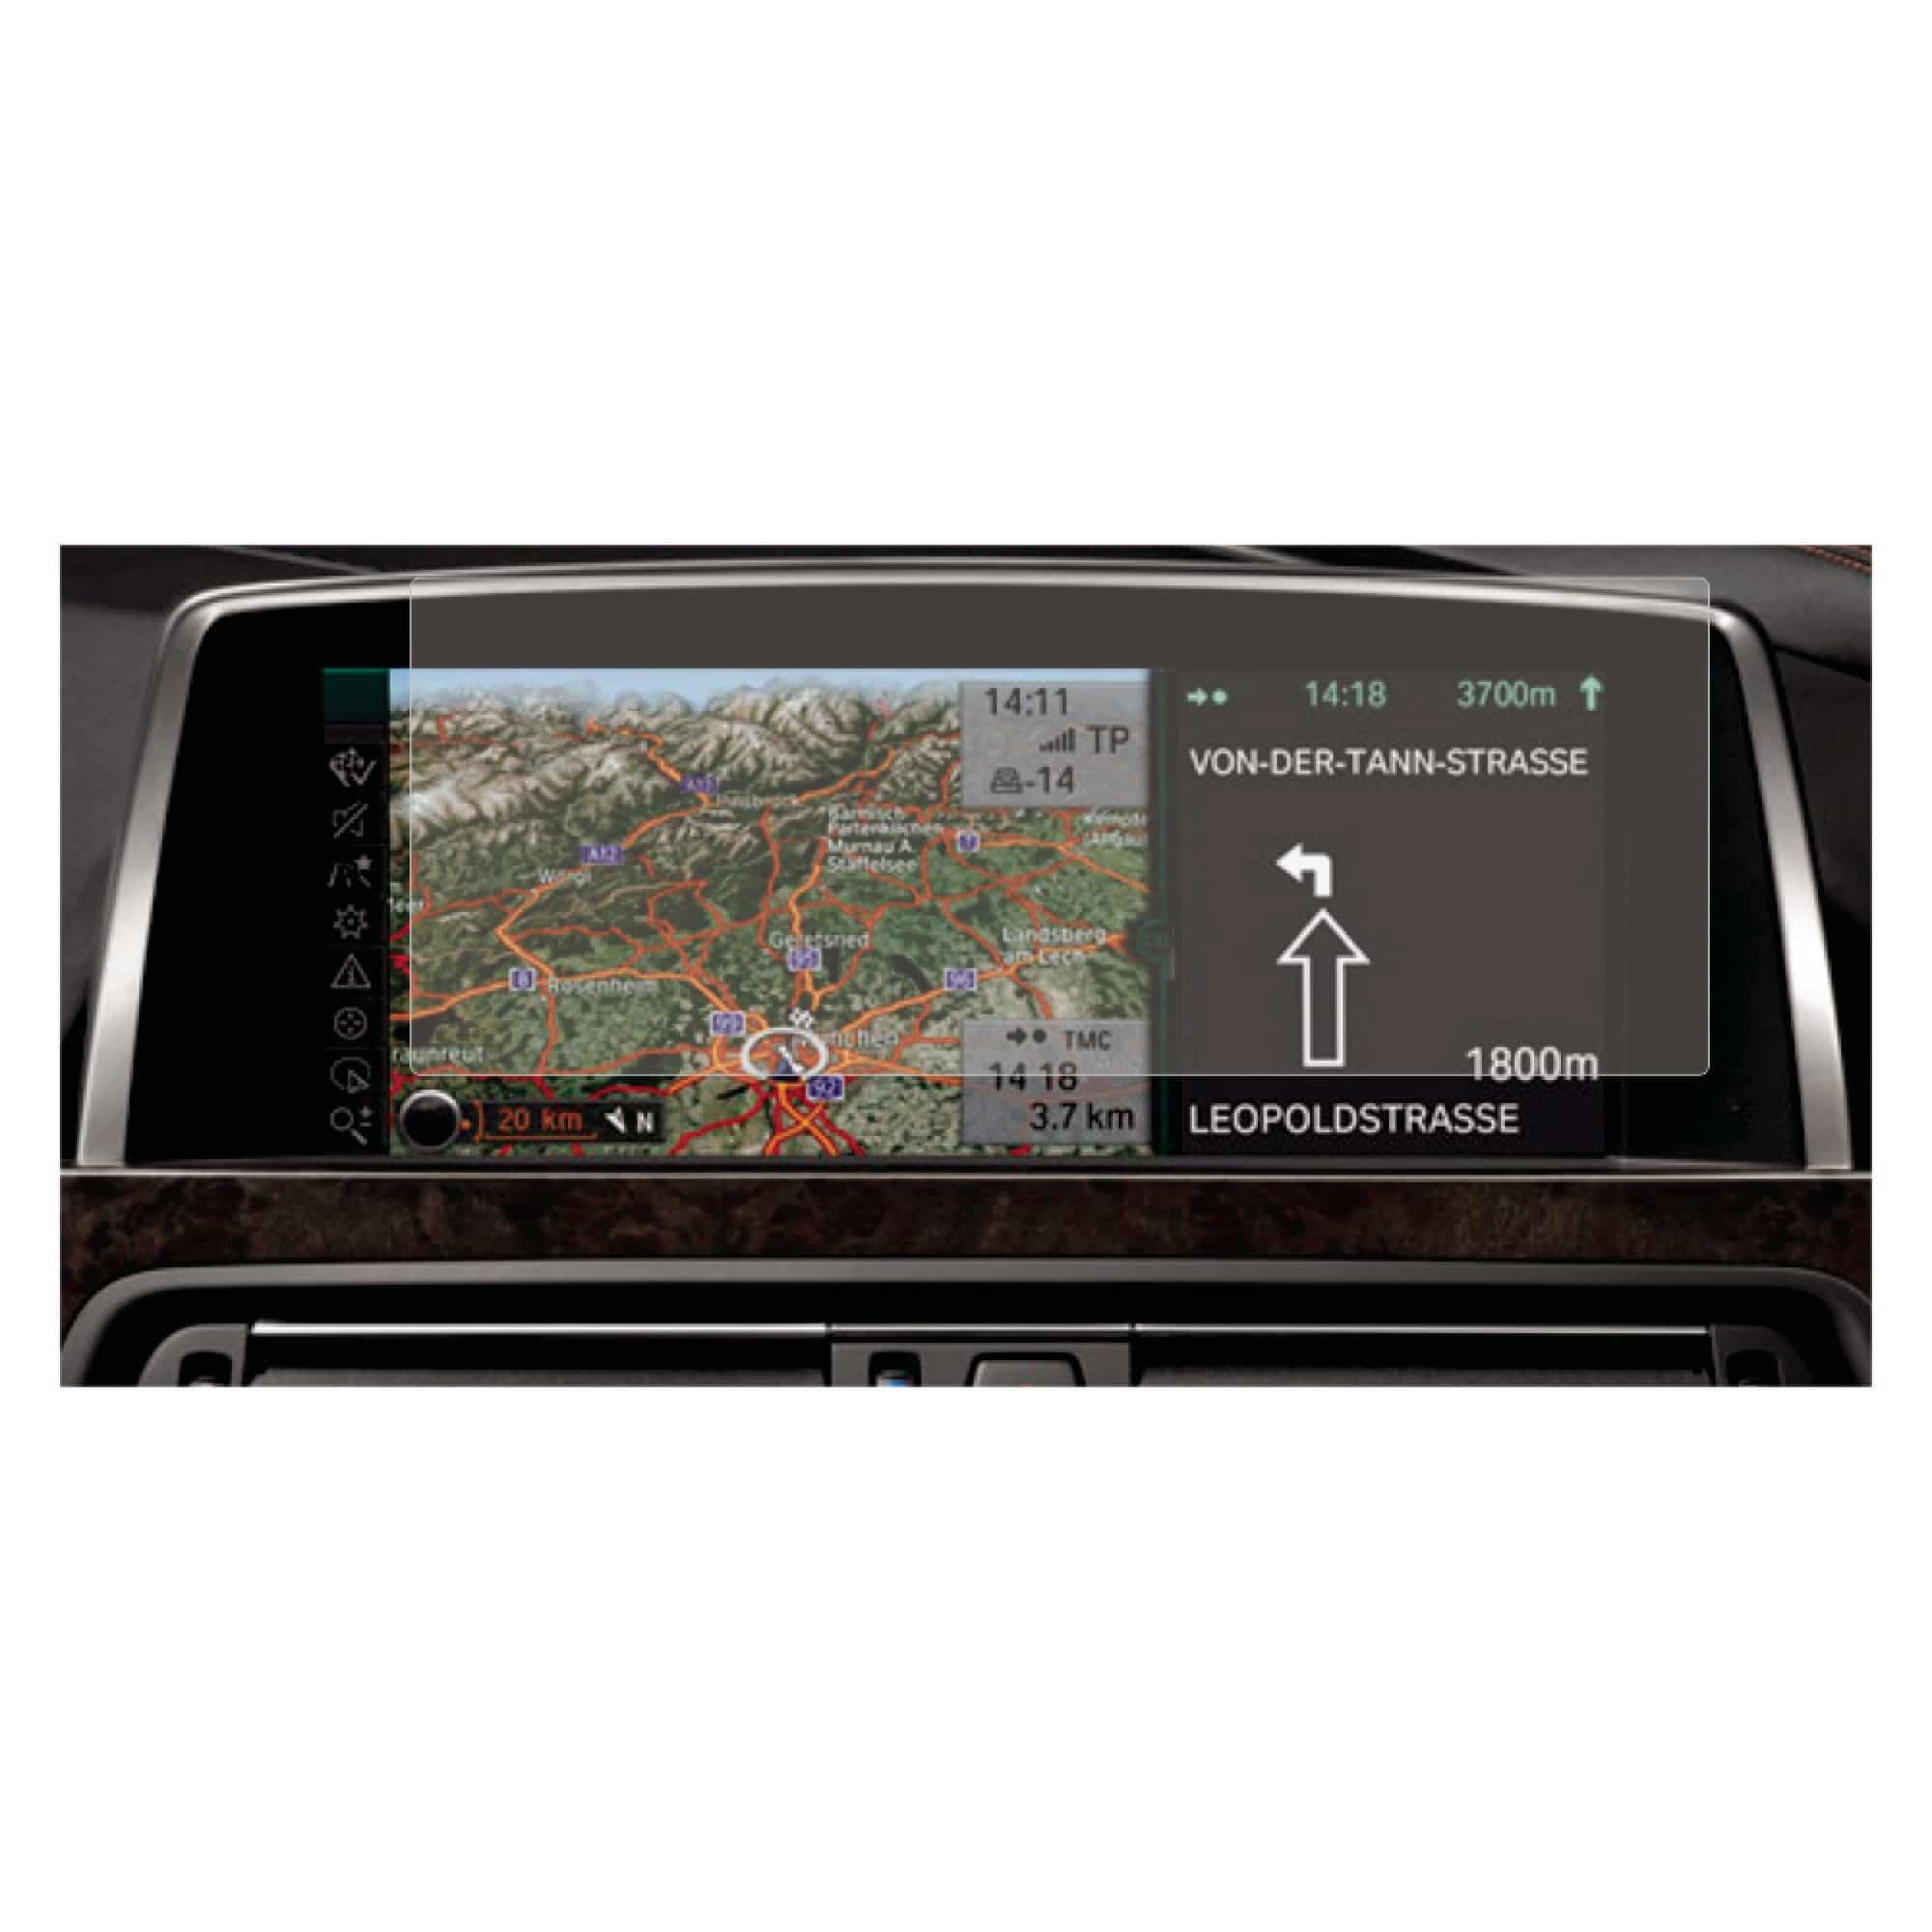 Folie de protectie Antireflex Mata Smart Protection Navi BMW Seria 3 F30 2012 NBT - doar display imagine